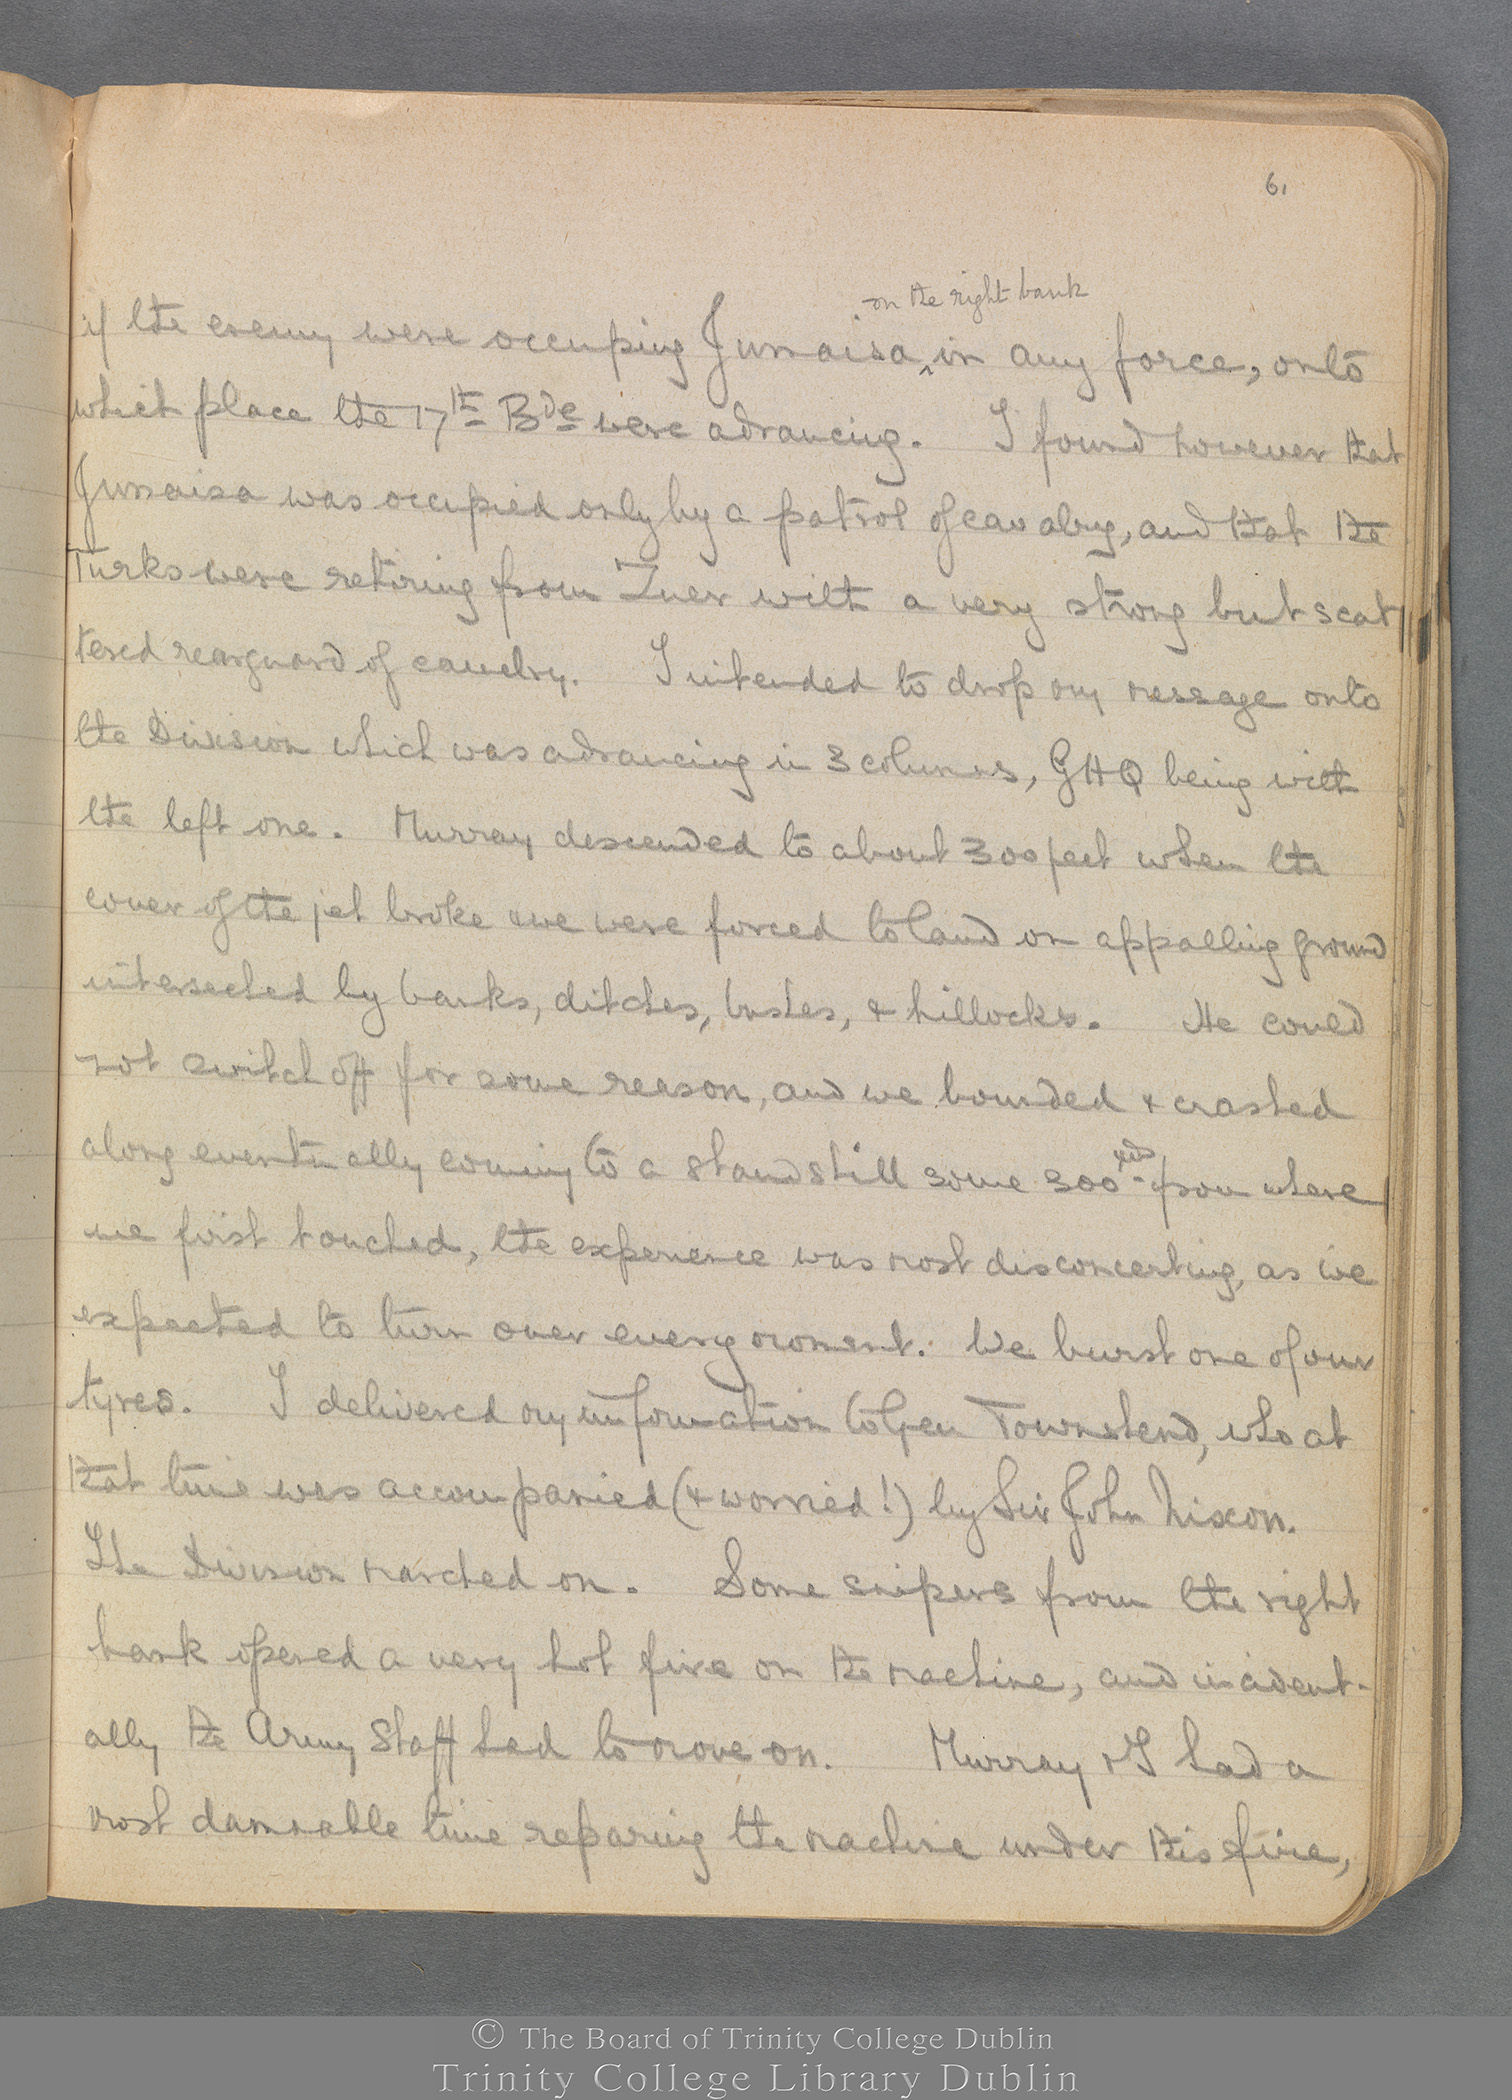 TCD MS 3414 folio 61 recto